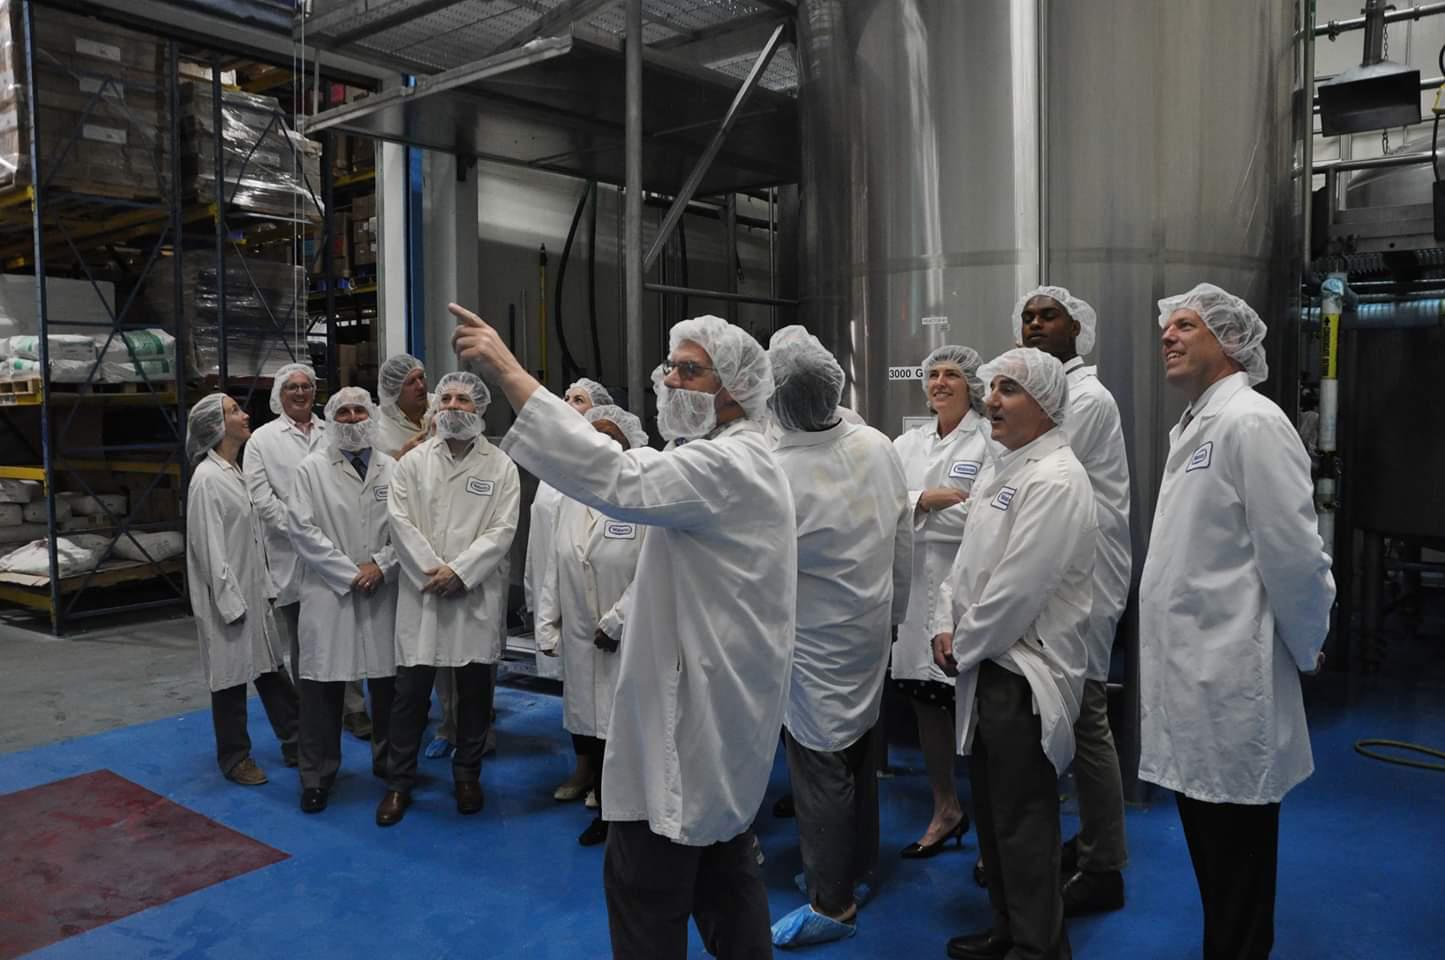 Tour of Watson facility